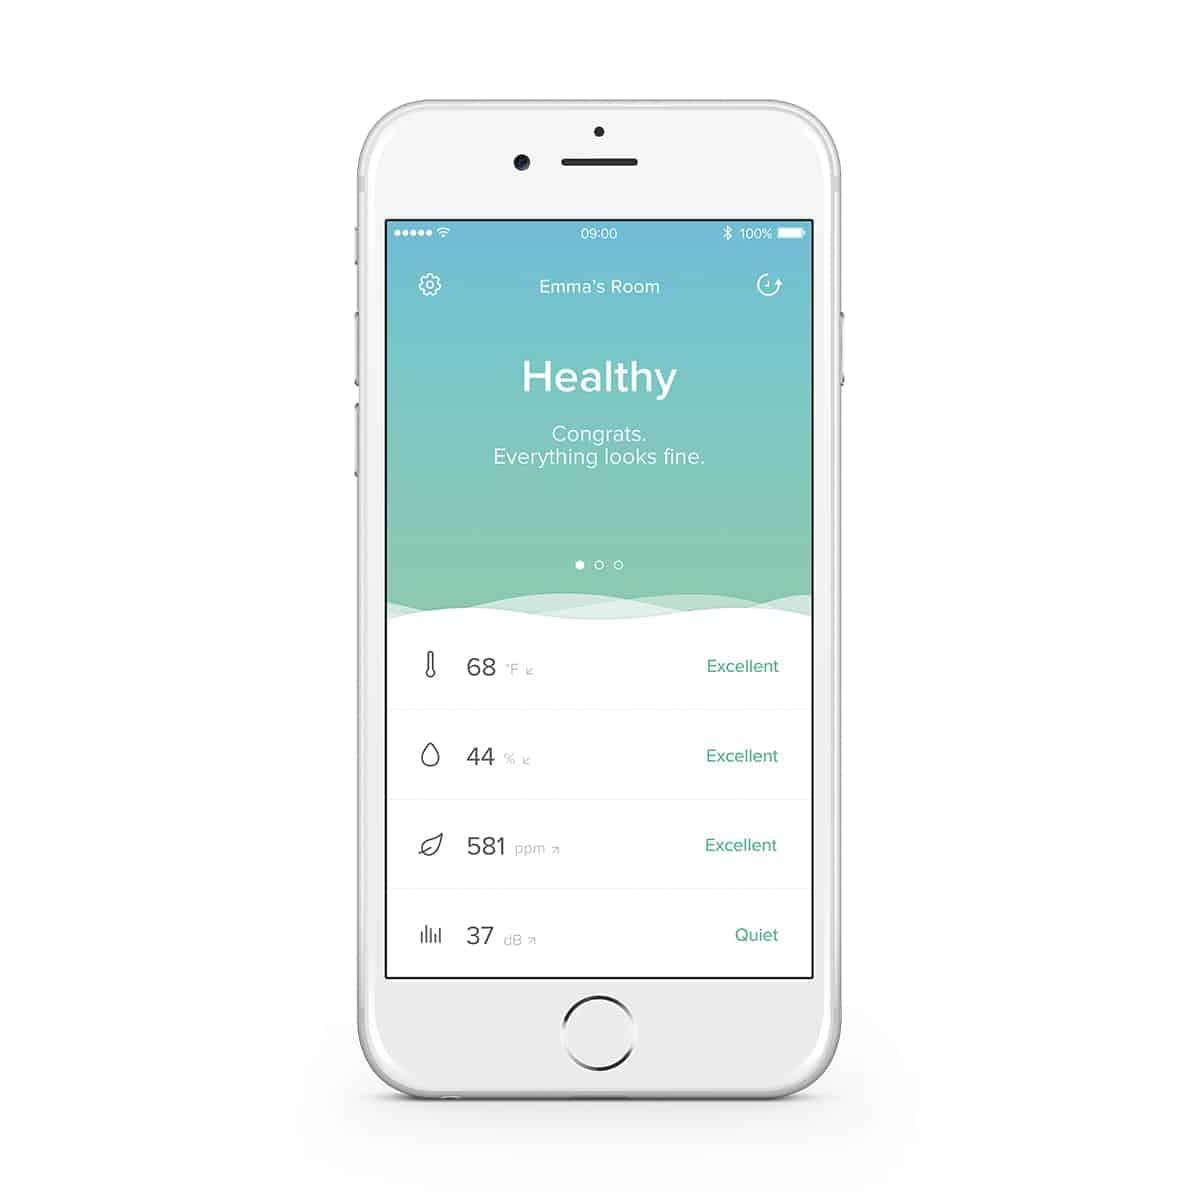 IPhone6 healthy